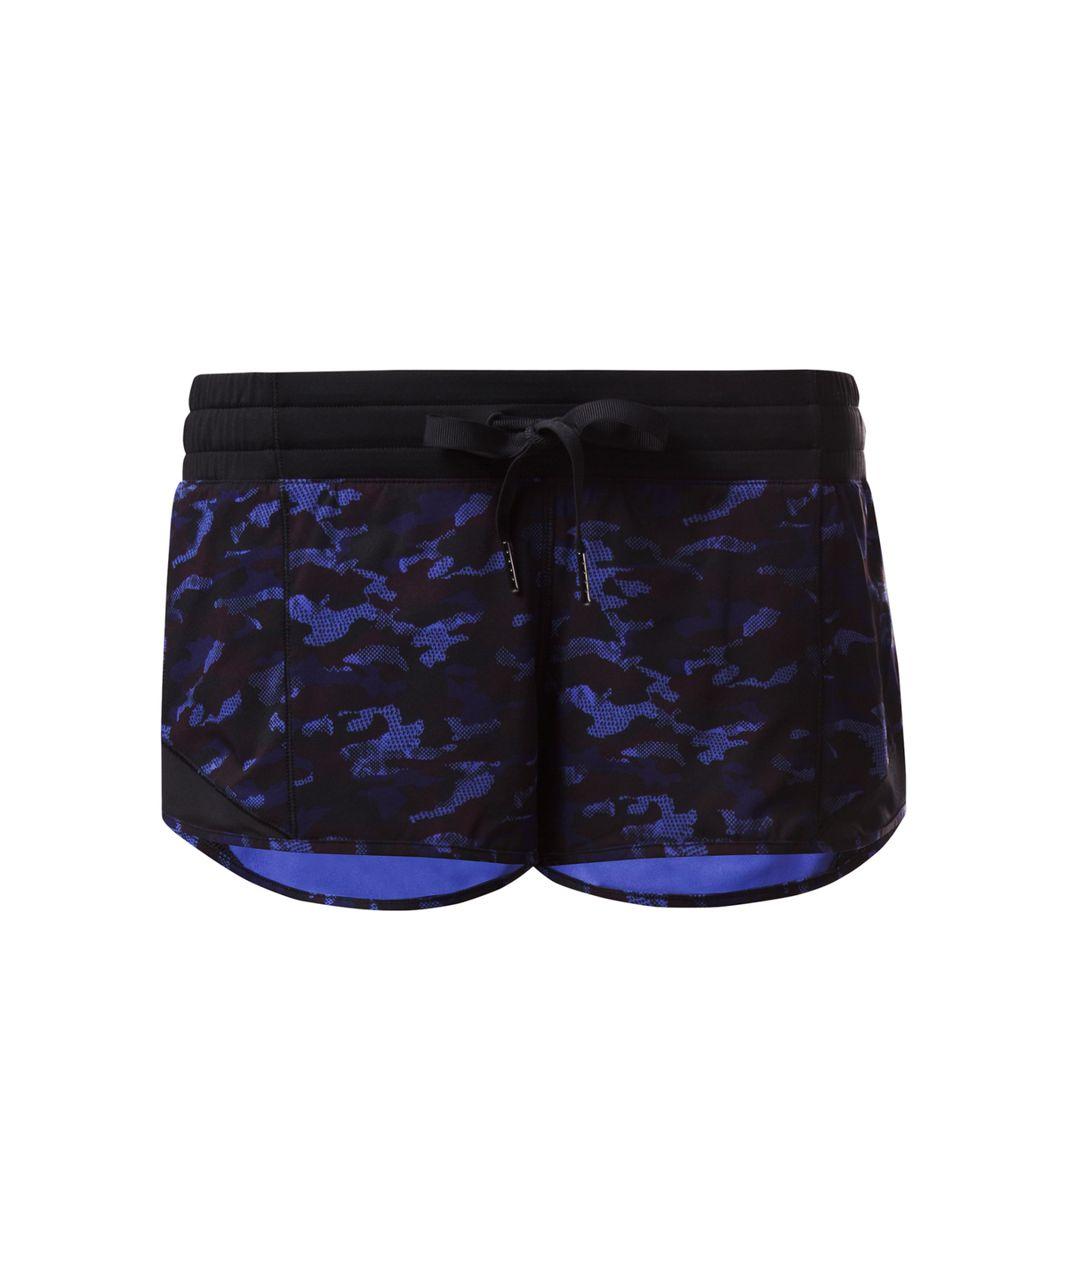 Lululemon Hotty Hot Short - Mini Hounds Camo Emperor Blue Black / Black